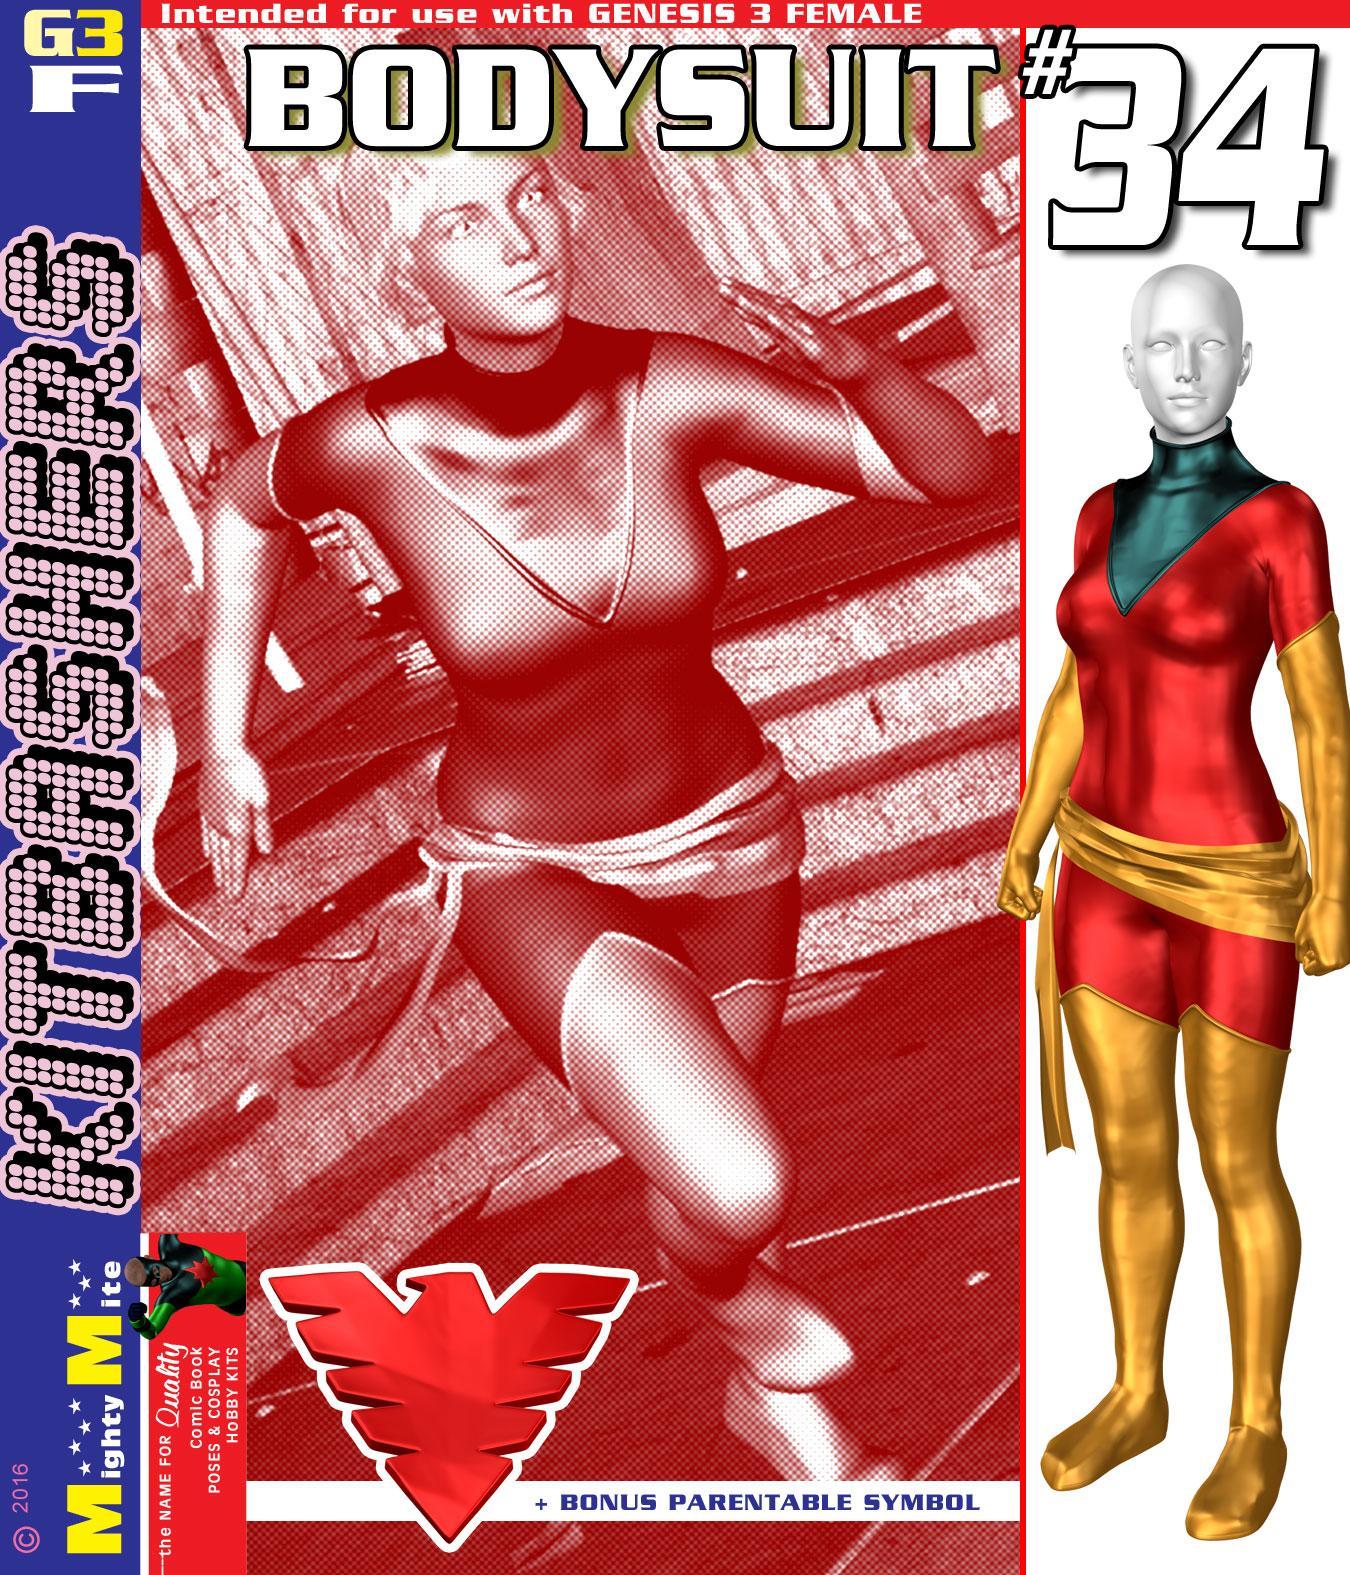 Bodysuit 034 MMKBG3F